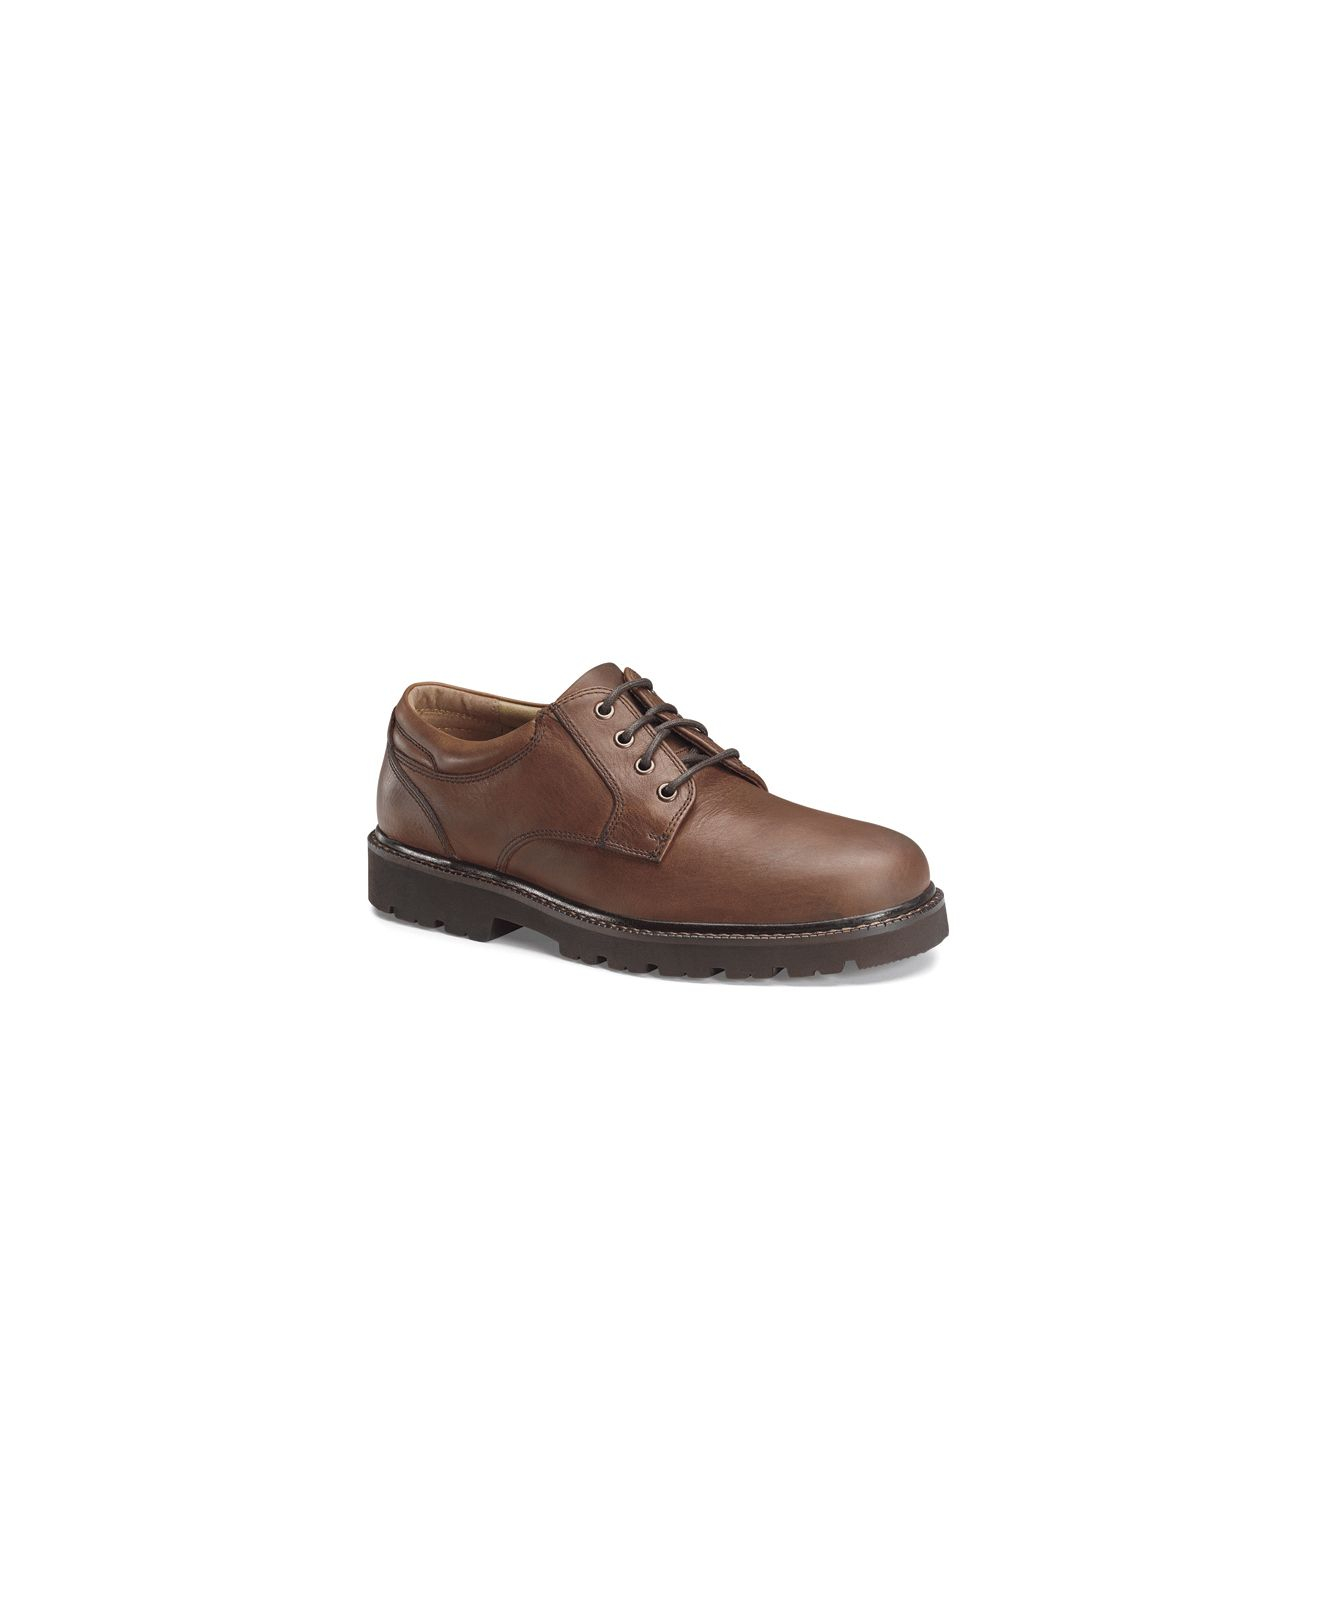 Dockers Shoes Shelter Stain Defender Plain Toe Oxfords